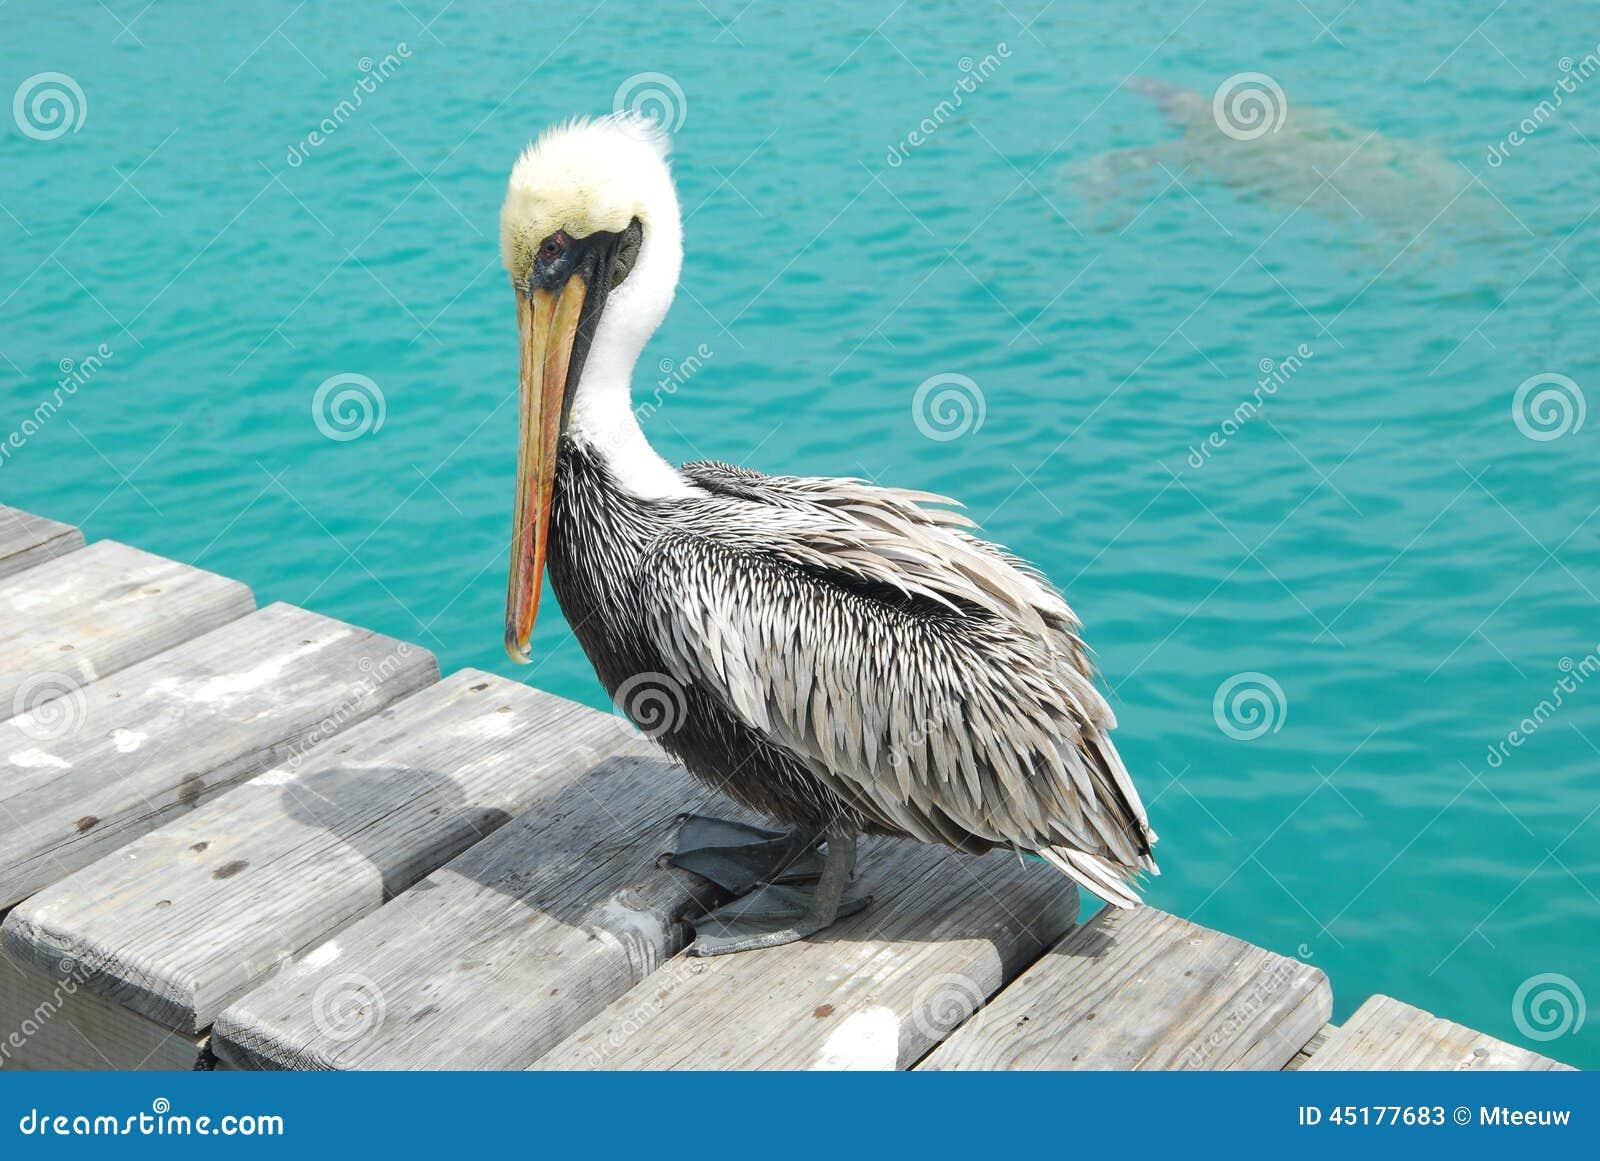 Pelican Royalty-Free Stock Image